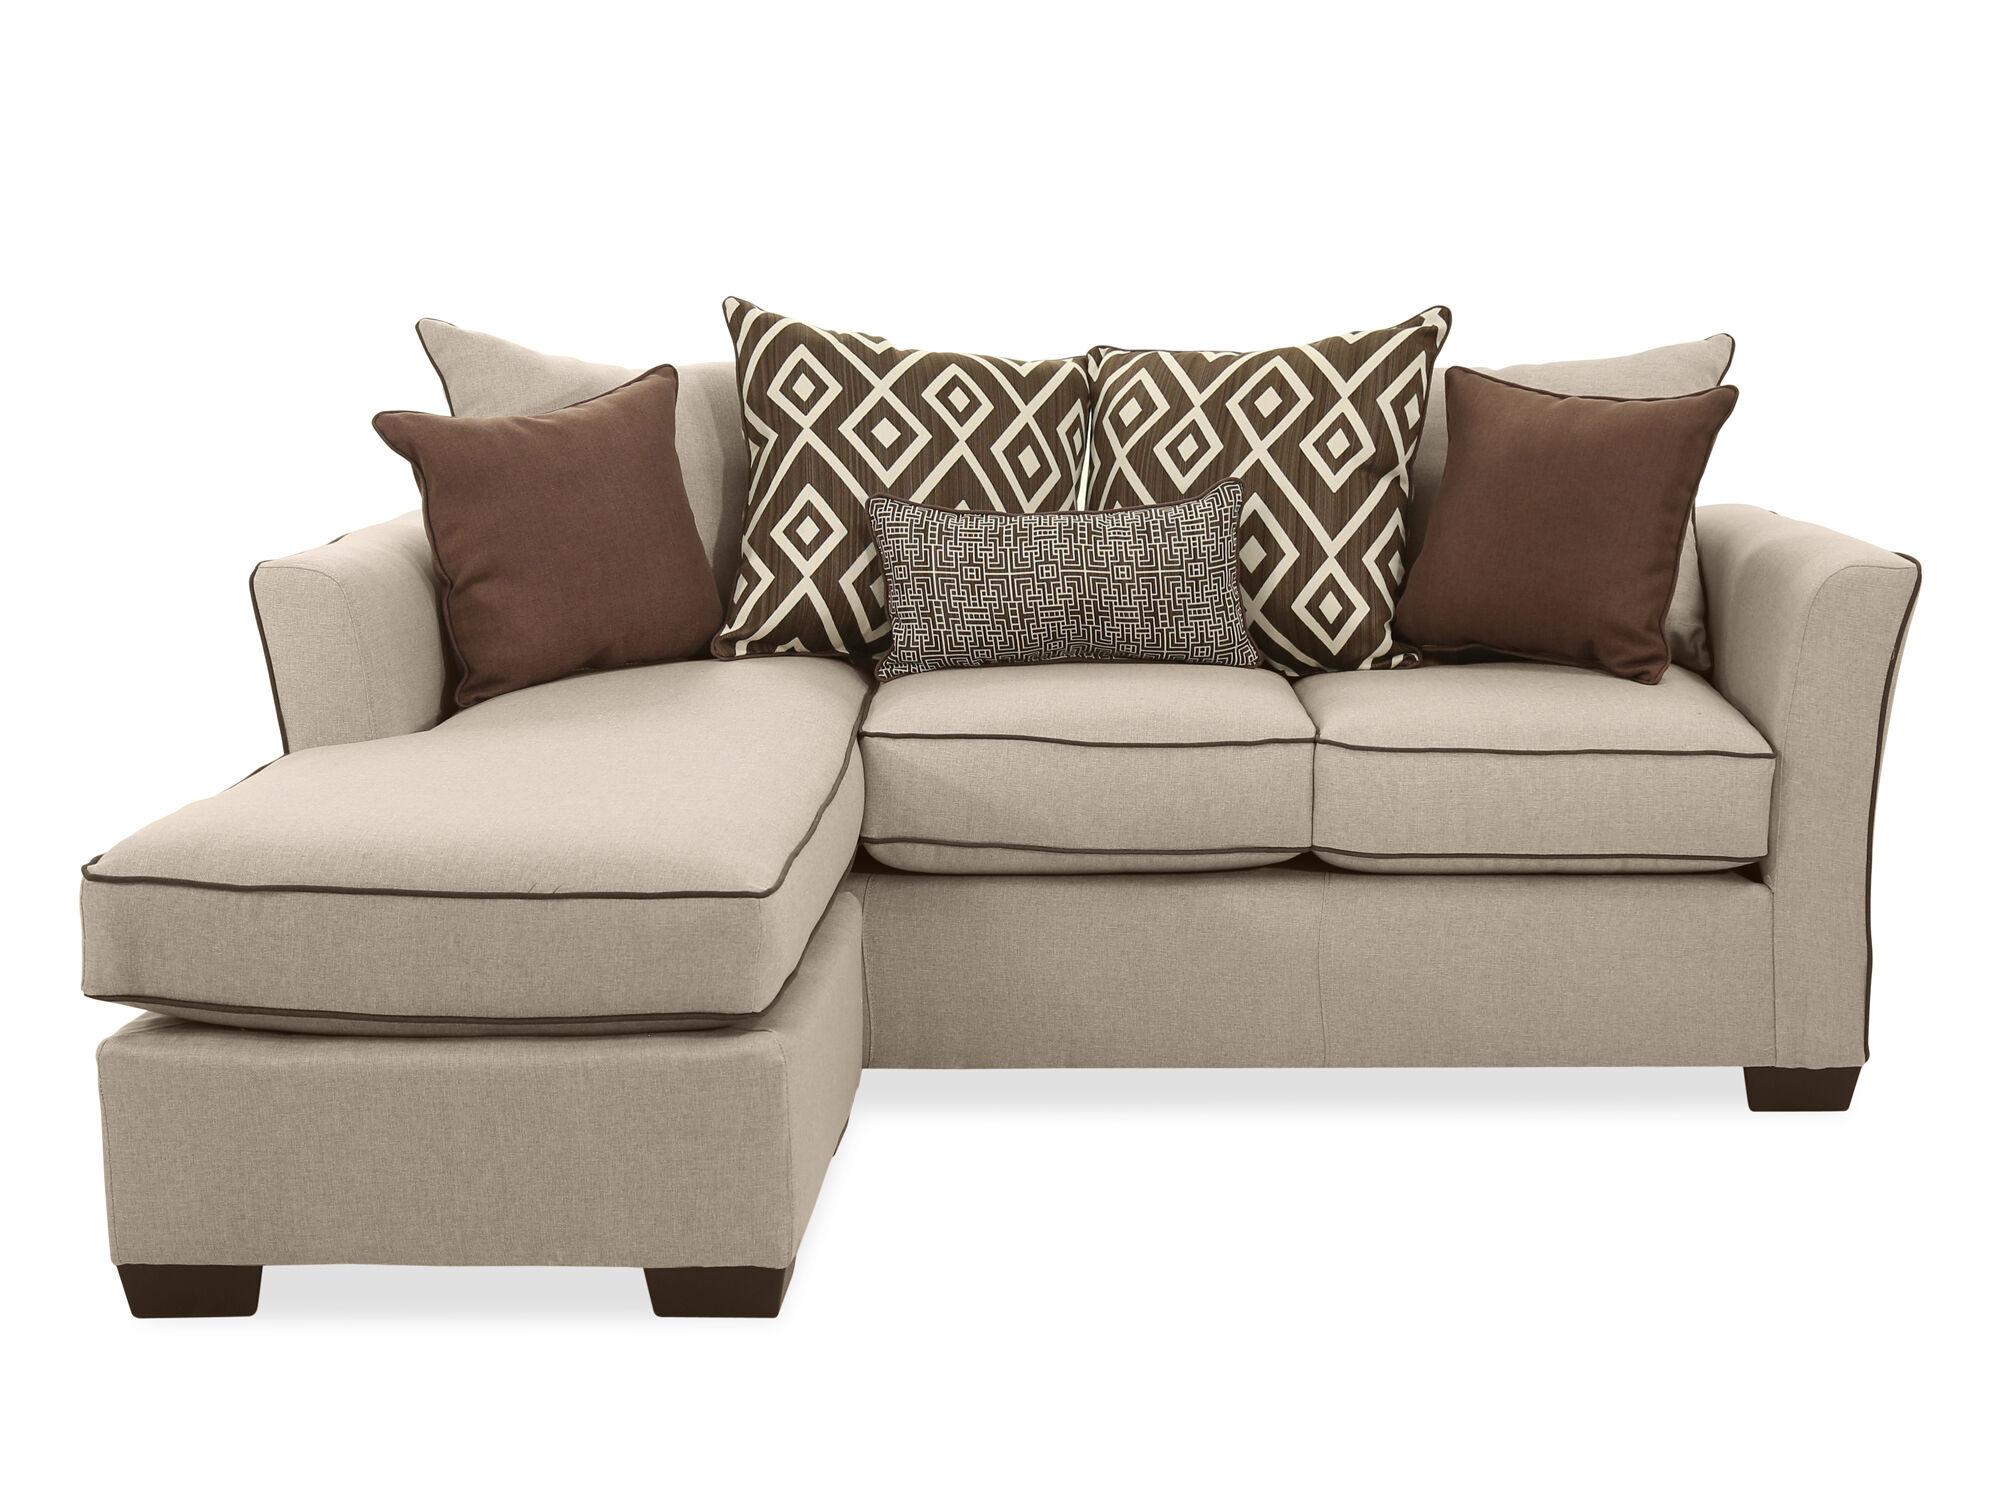 sofas tulsa ok 130 cm width sofa bed transitional 86